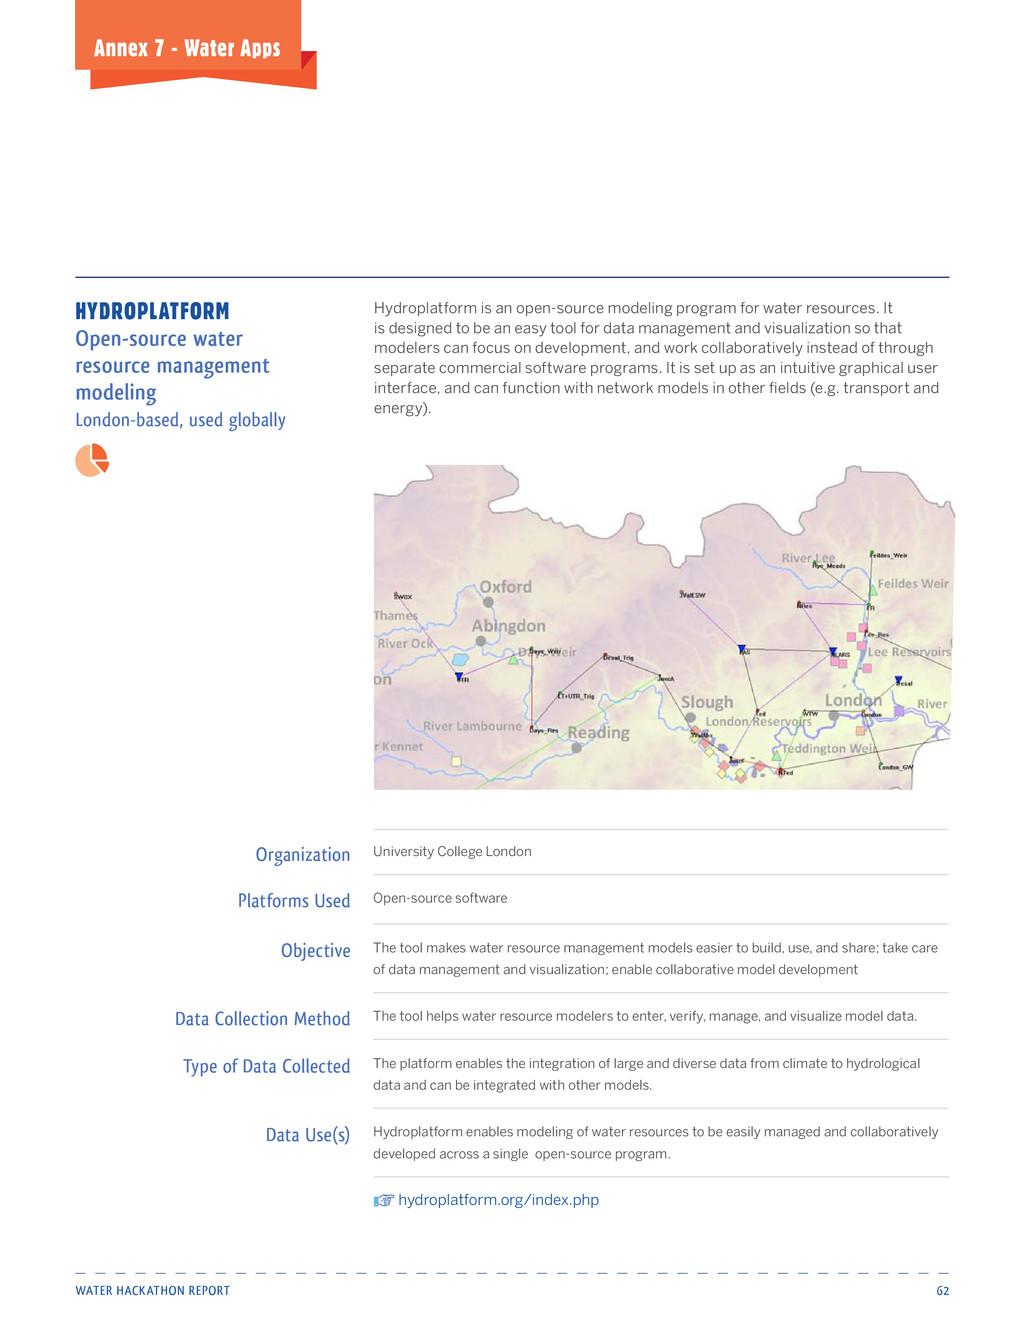 Water HackatHon report 62 Annex 7 - water Apps ...